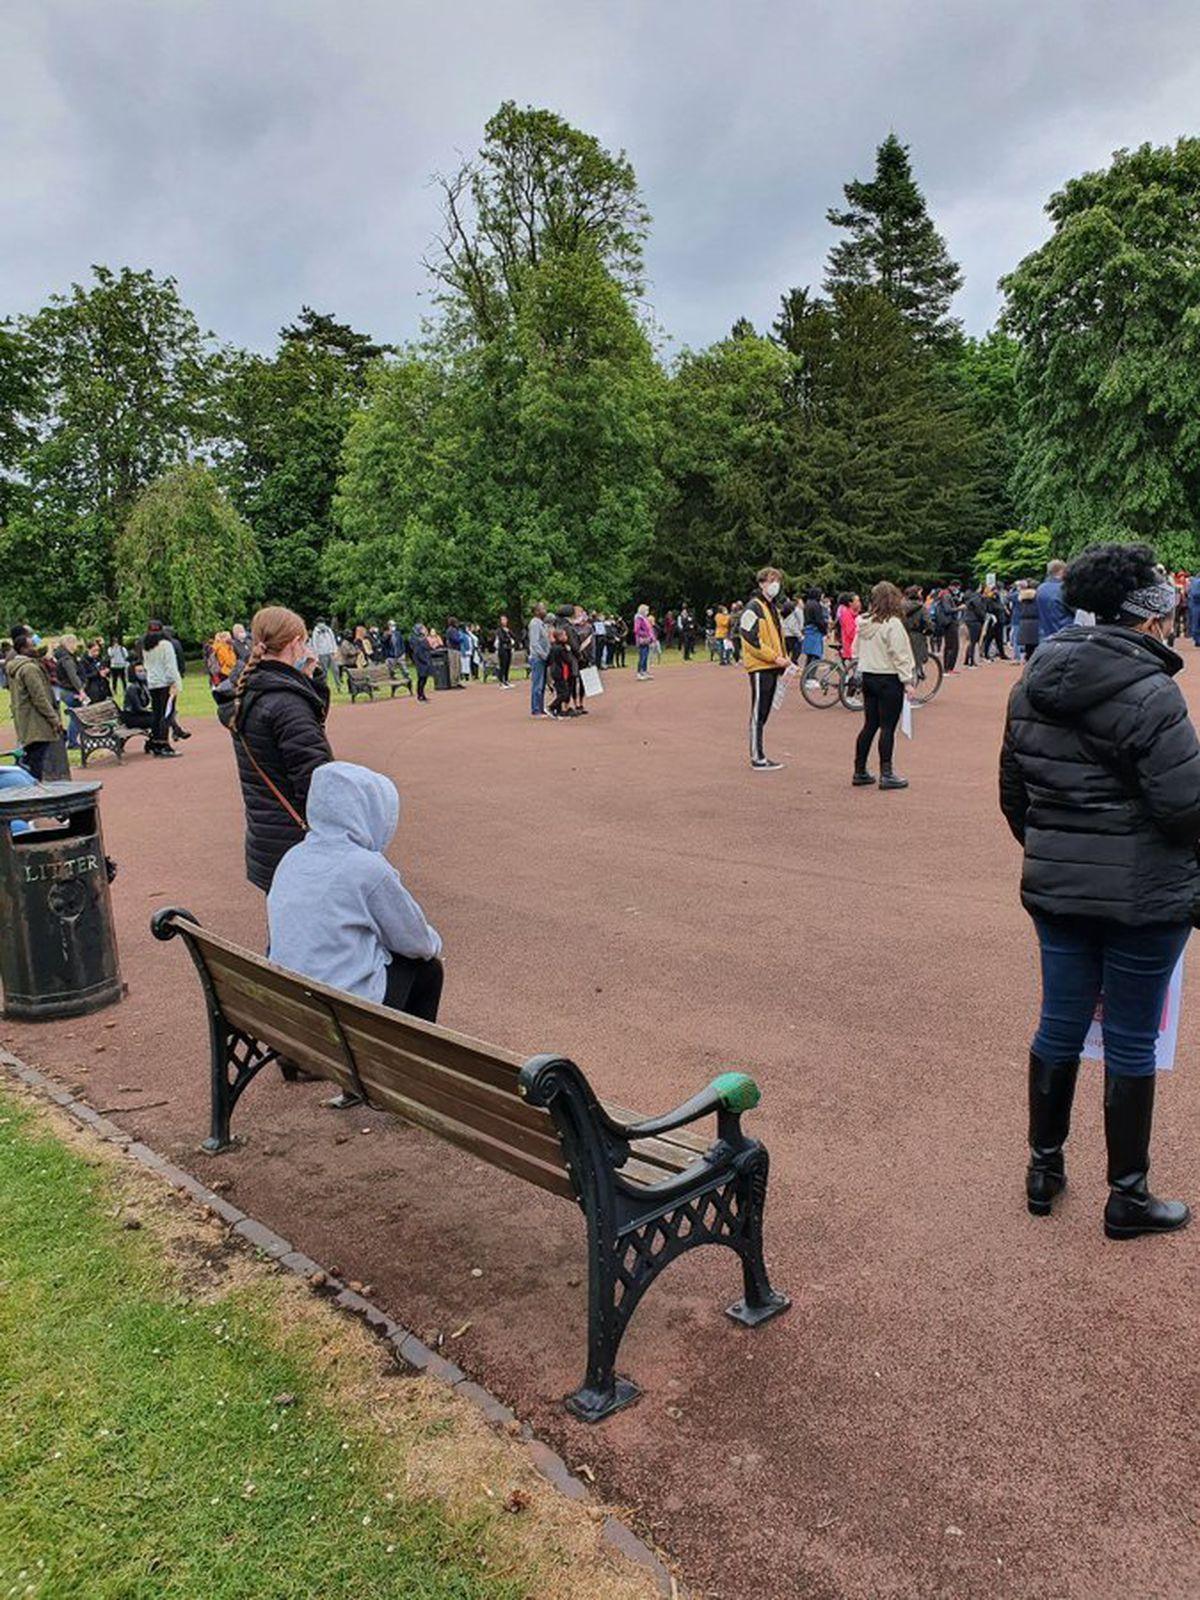 Wolverhampton's West Park held a Black Lives Matter rally on Sunday. Image: Dave Sheldon